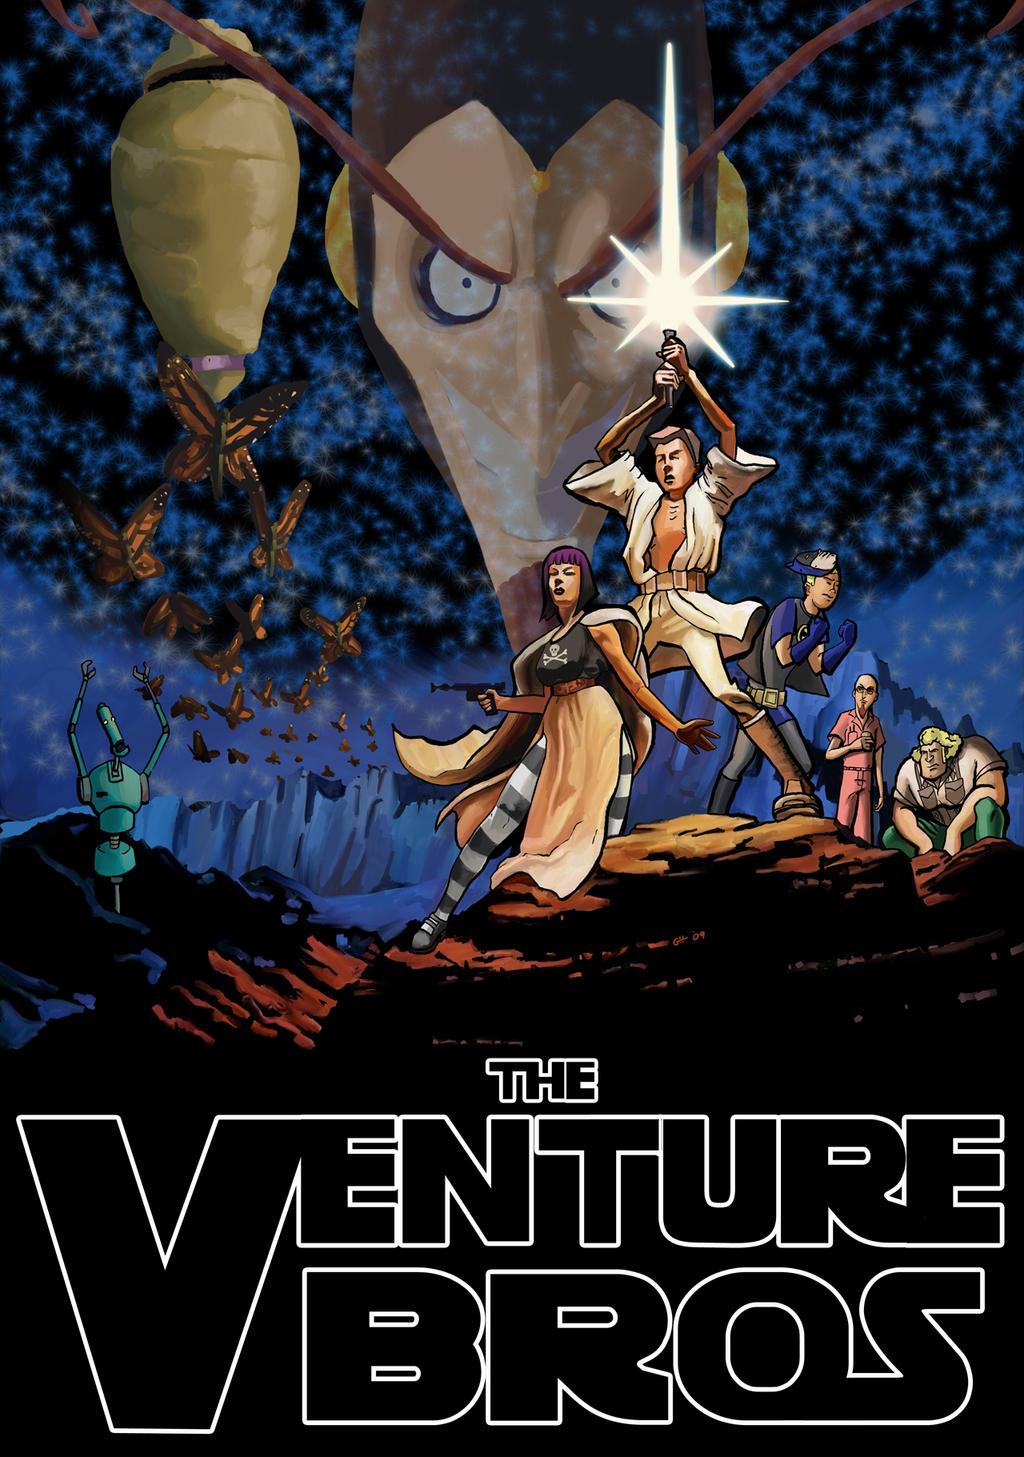 The venture bros by garrenh on deviantart - Venture bros wallpaper ...